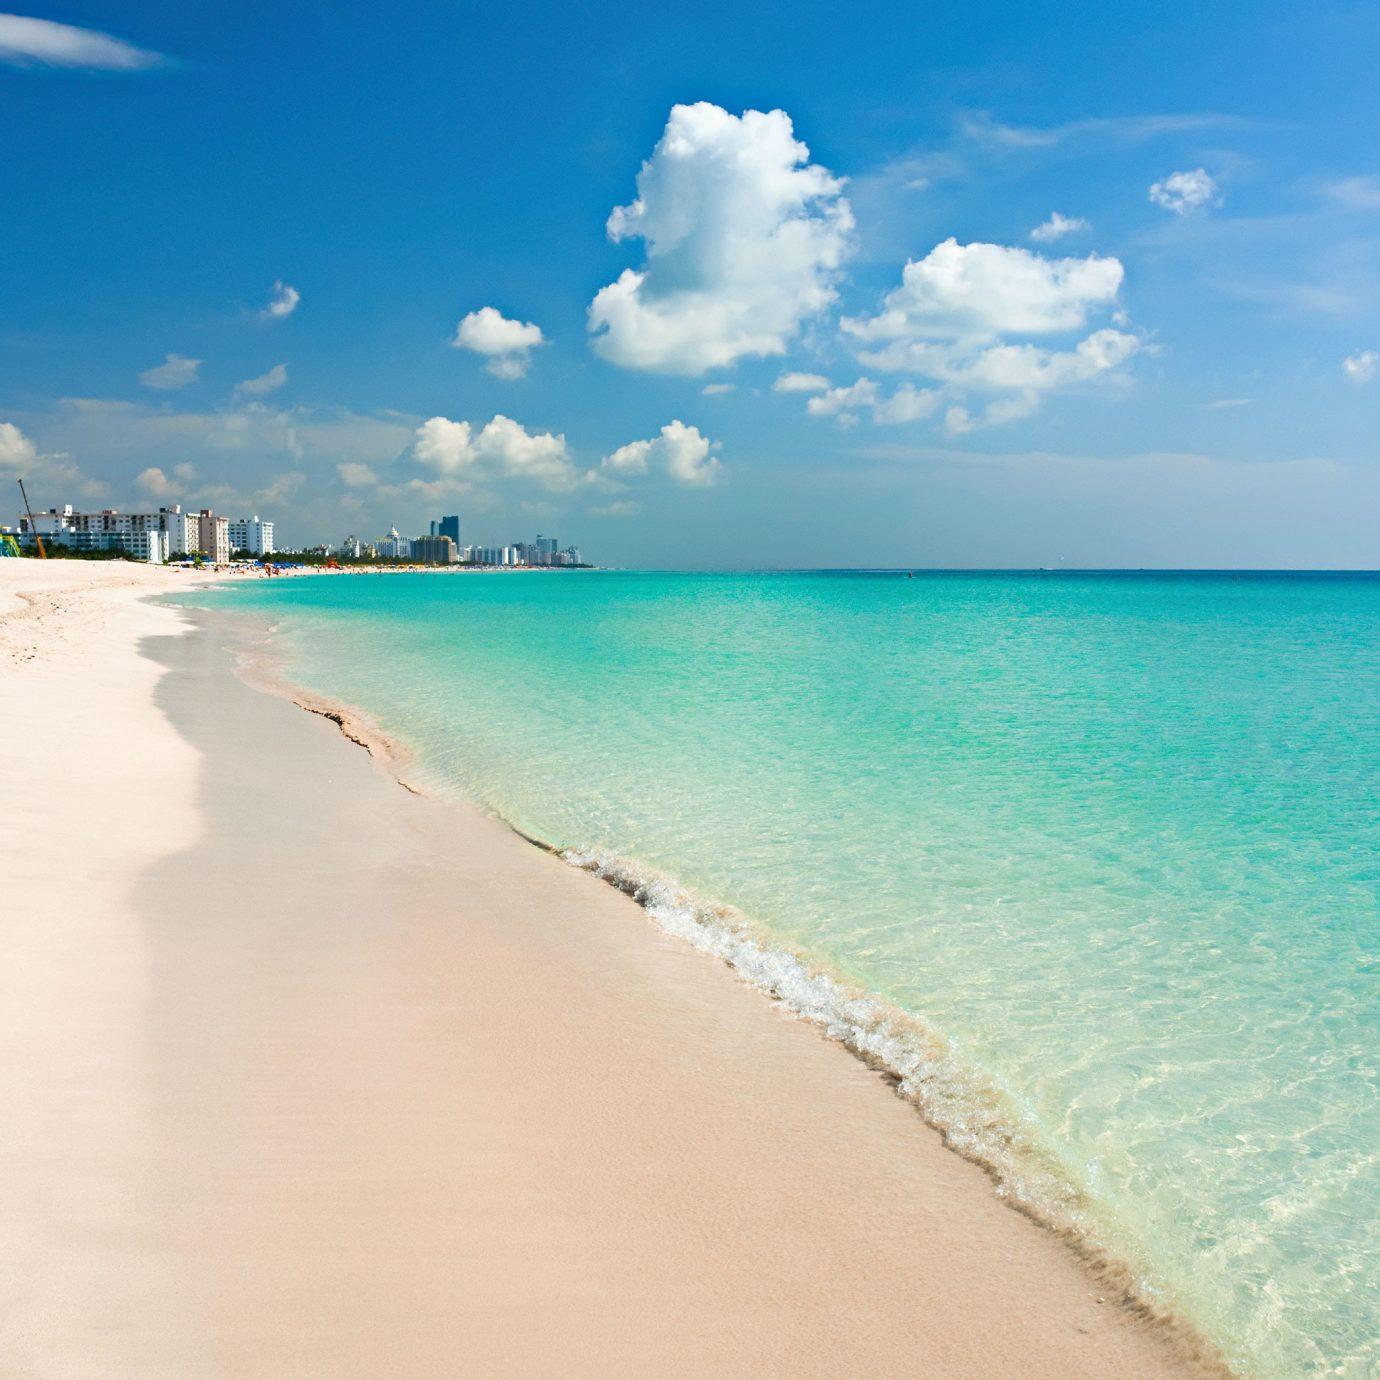 Beach Beachfront Ocean sky water ground Nature Sea shore horizon sand caribbean wave wind wave Coast sunlight cape tropics sandy day